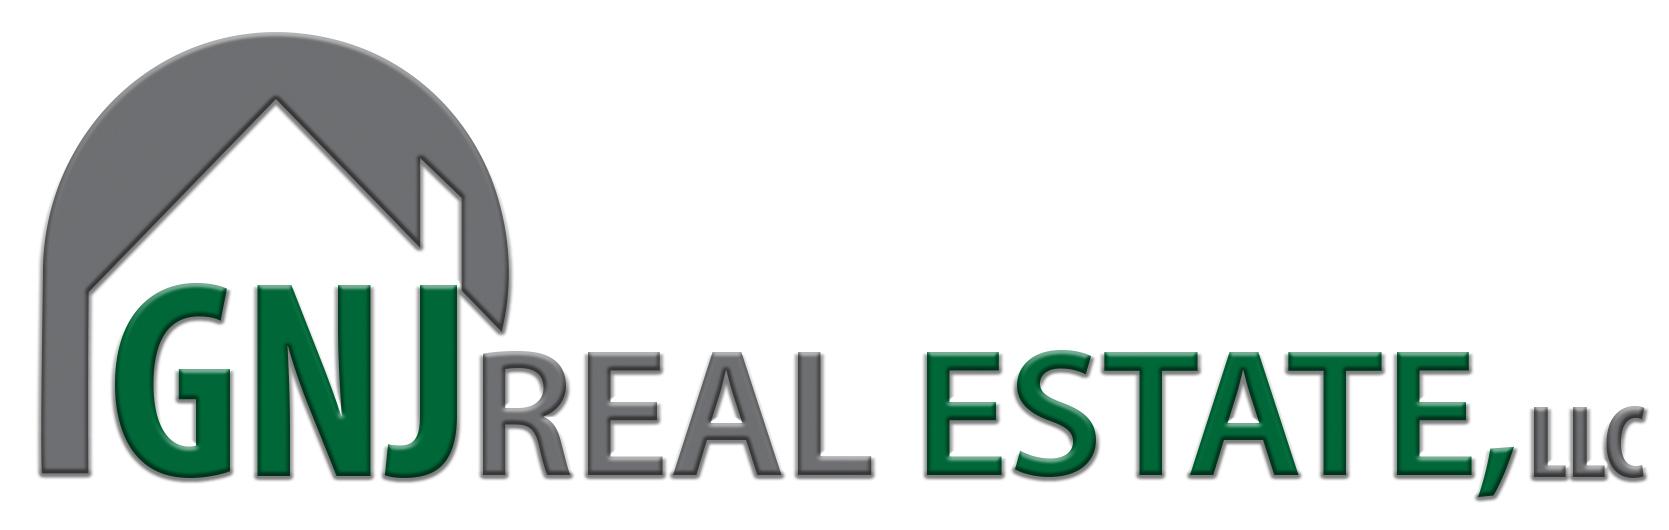 GNJ REAL ESTATE LLC LOGO